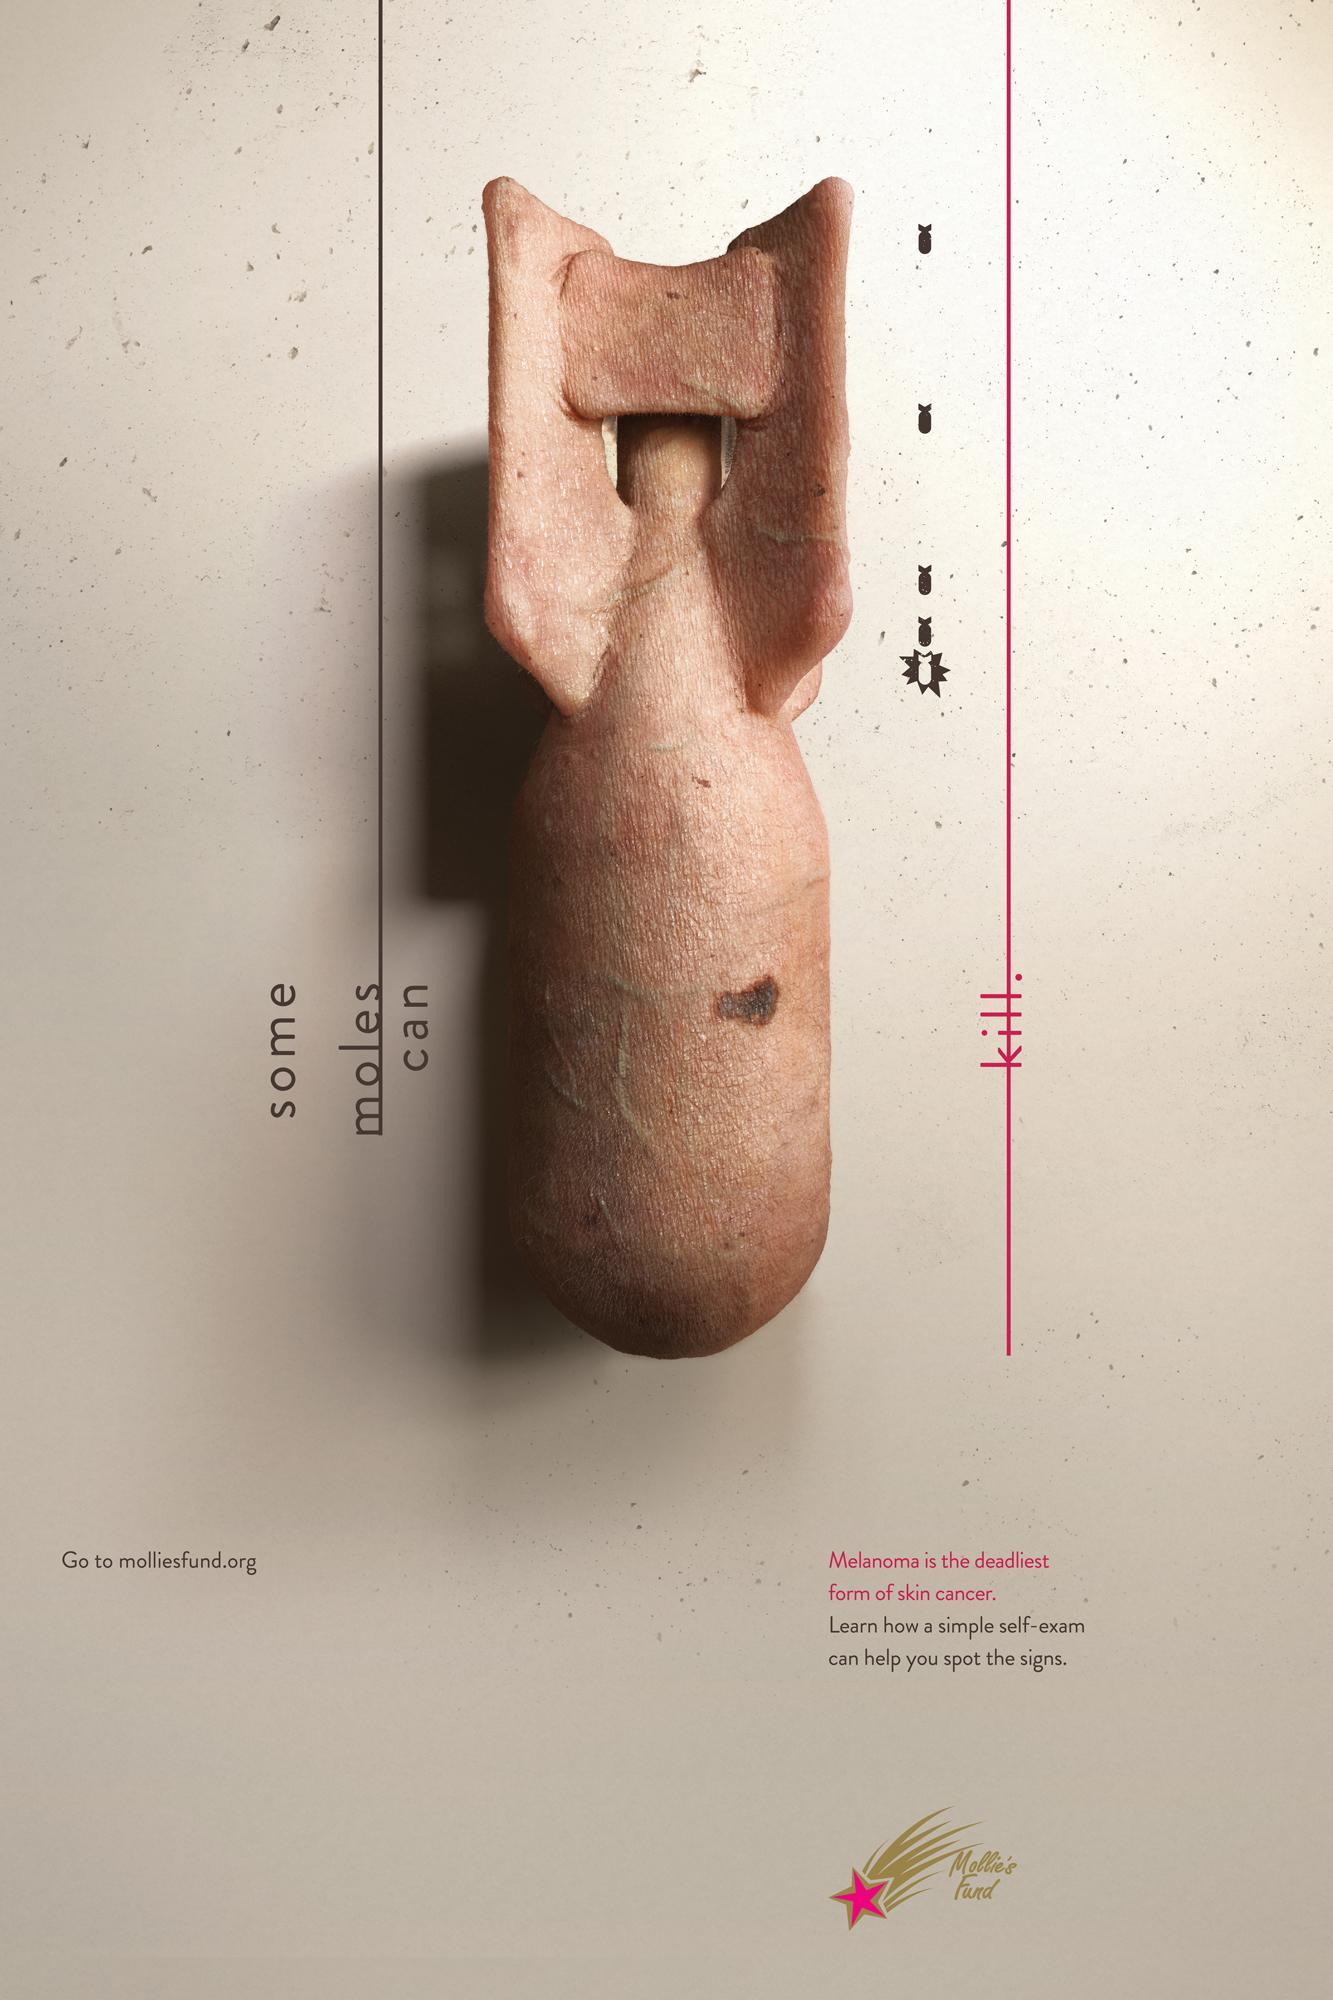 Mollie's Fund Print Ad - Skin Bombs - Warhead